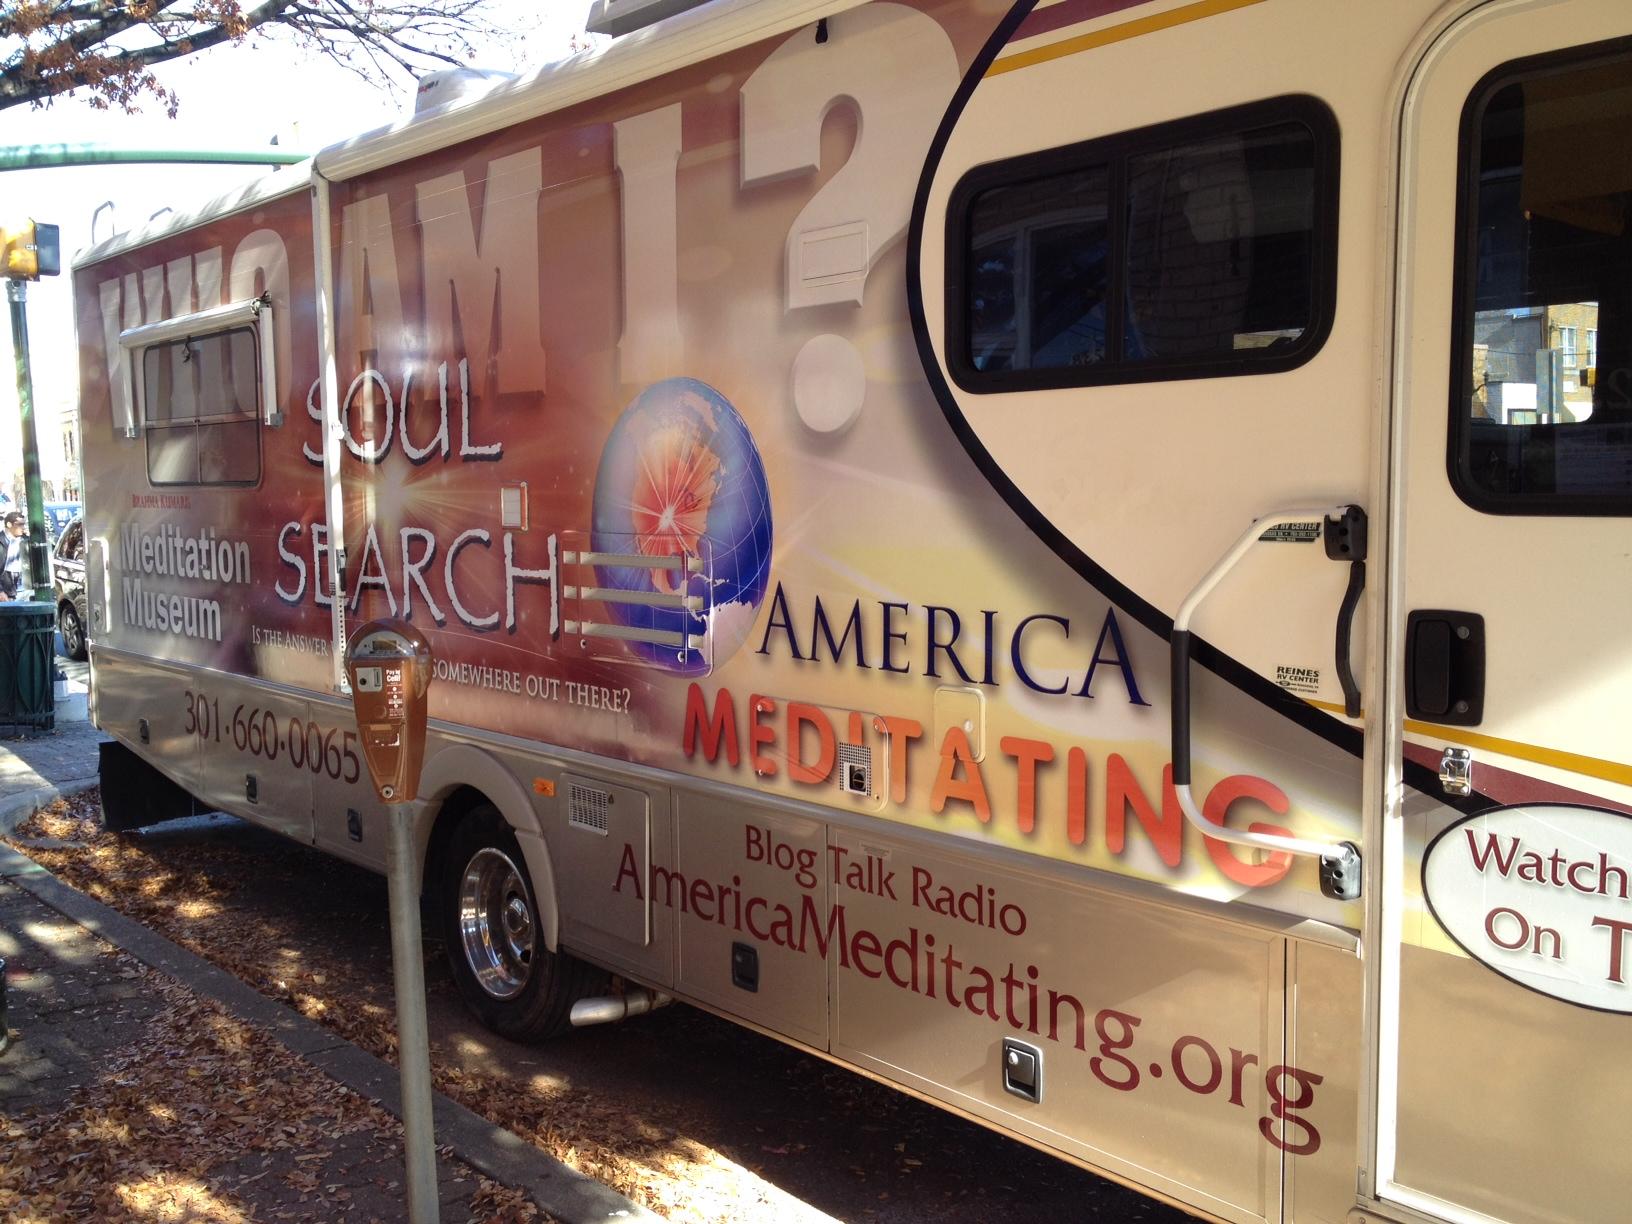 Meditation Museum RV rolls through Silver Spring for Thanksgiving parade